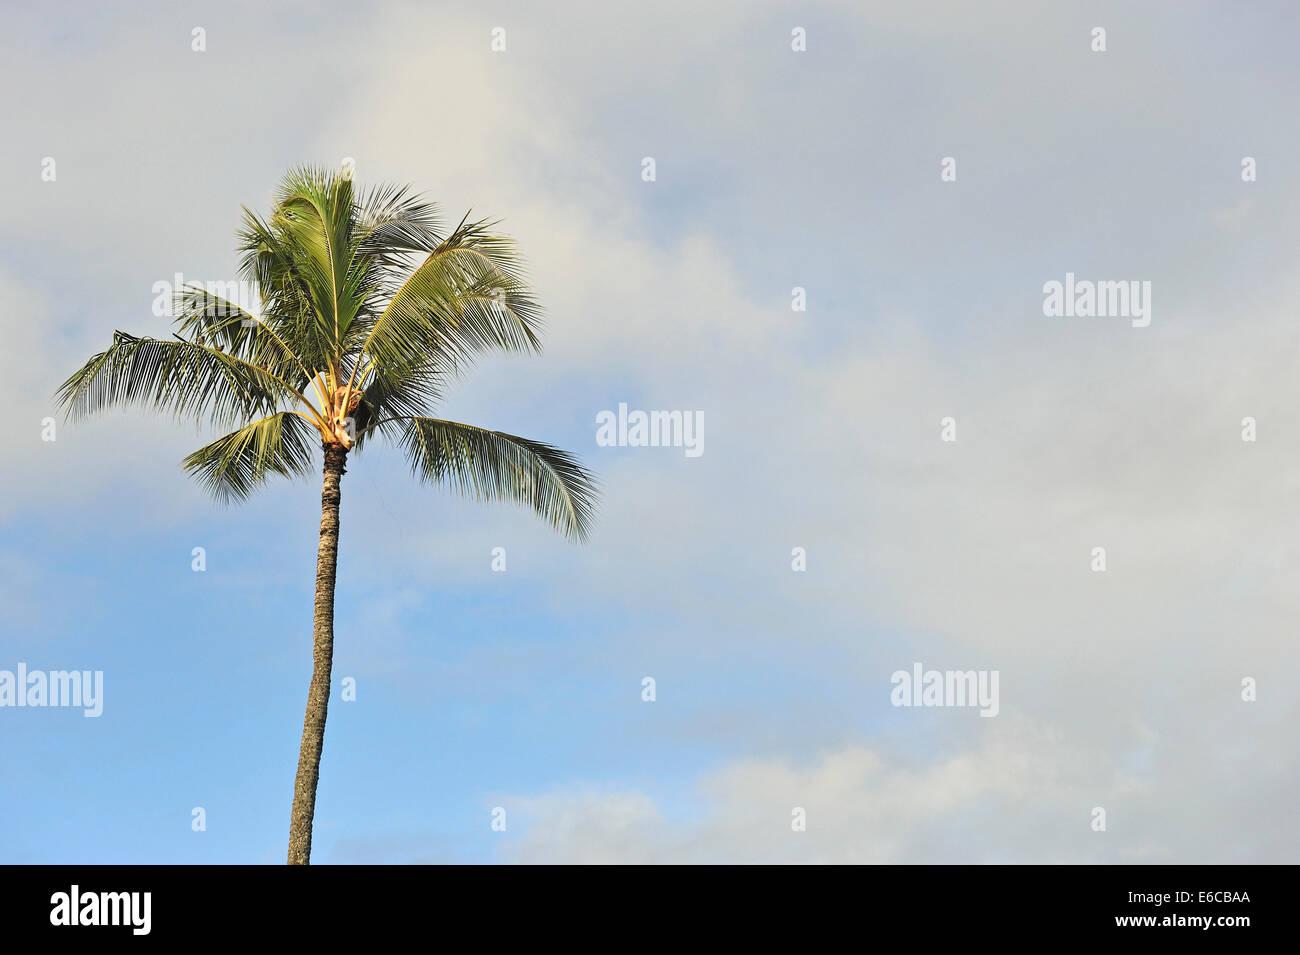 Palm tree treetop Immagini Stock